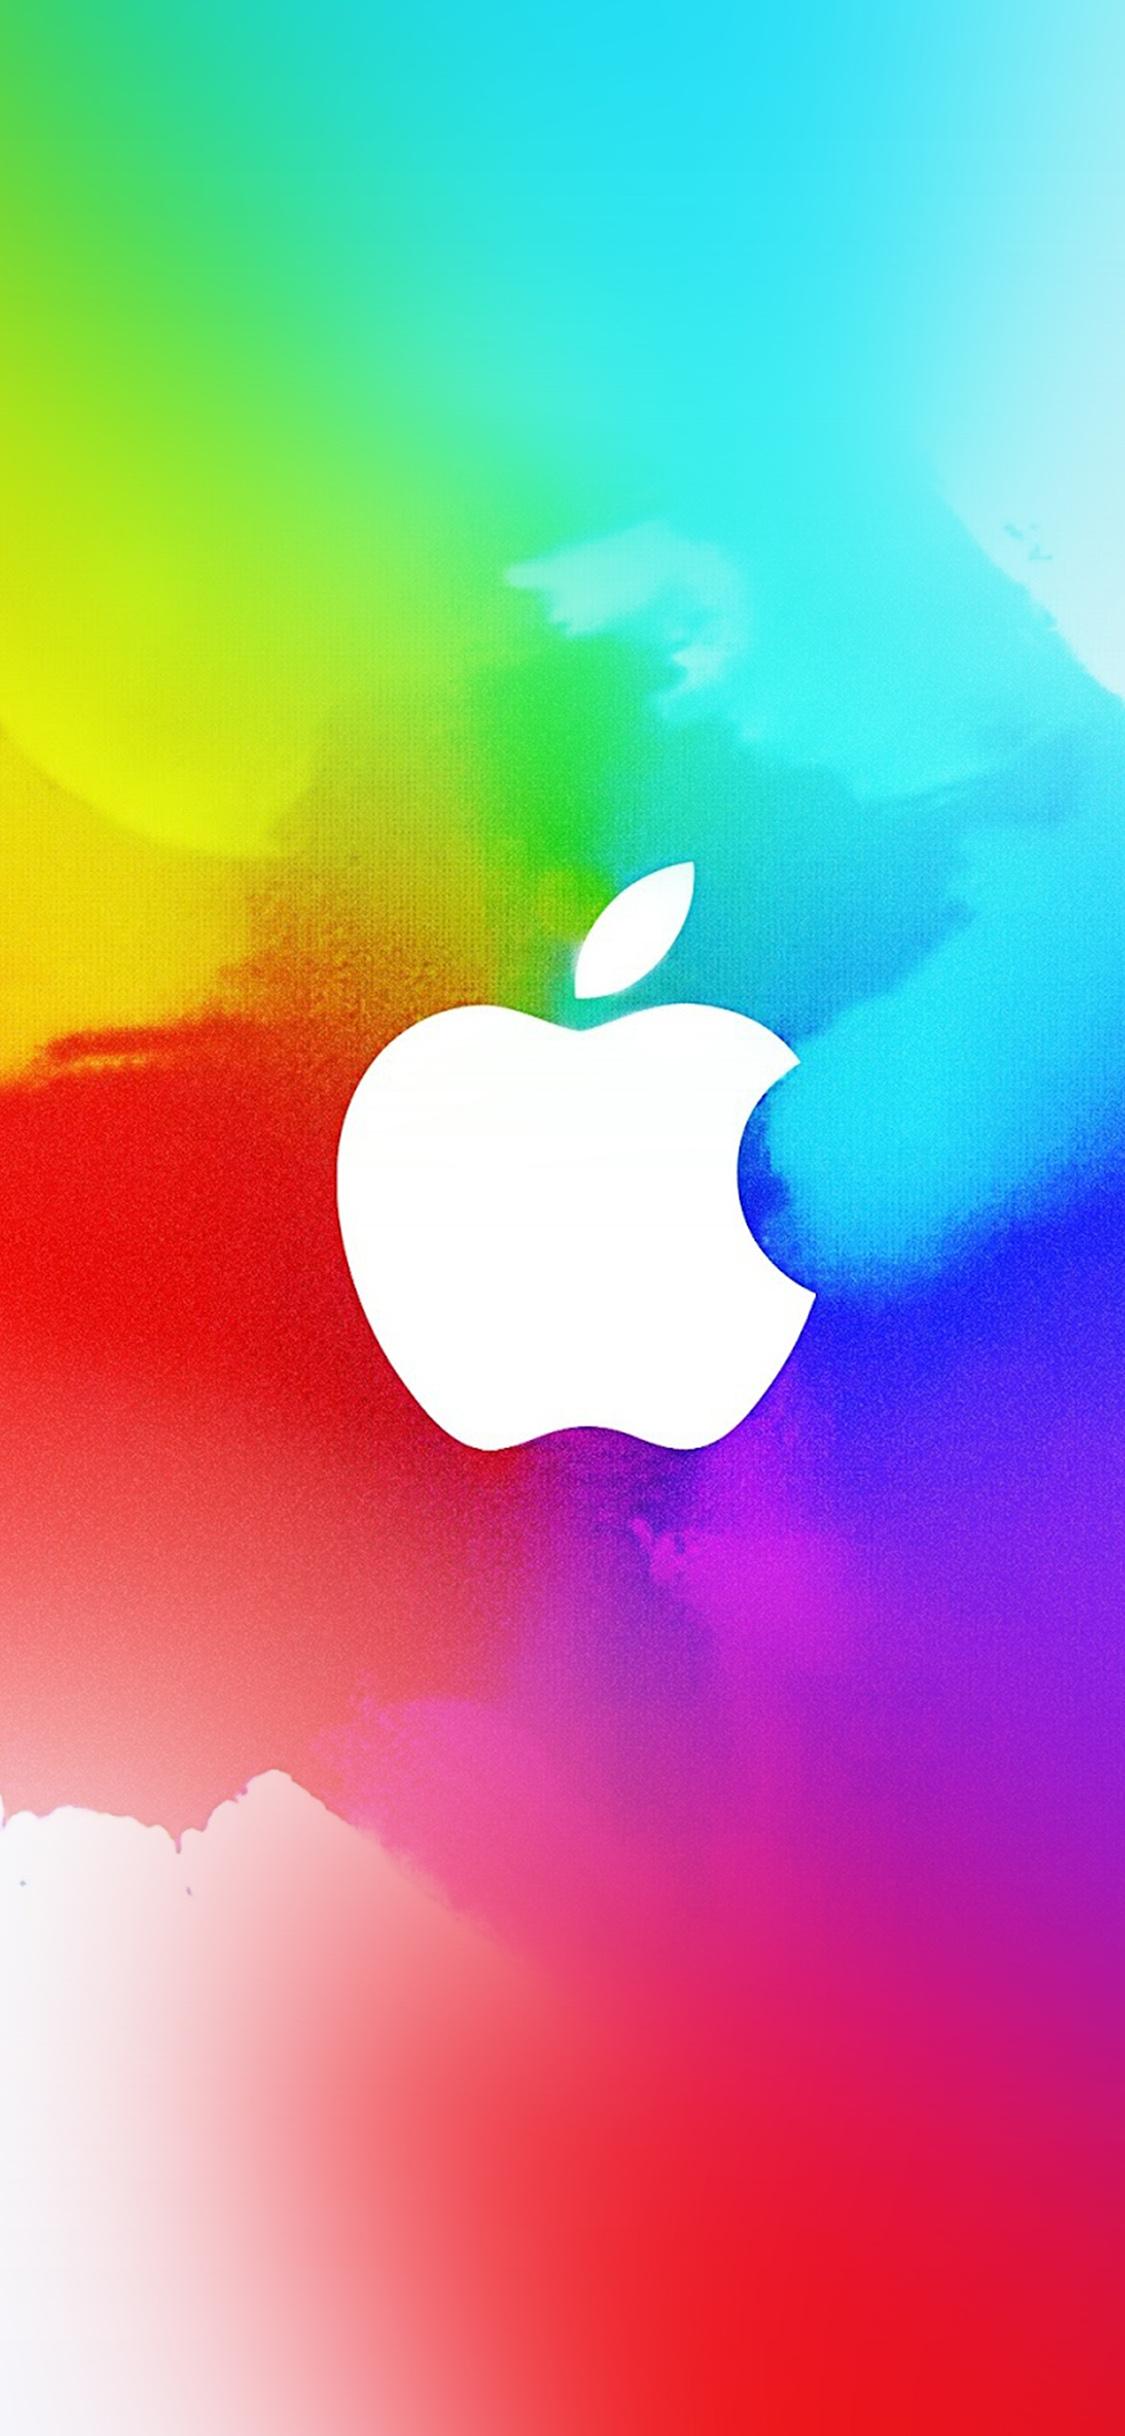 3d Wallpaper For Macbook Pro 13 Ay37 Apple Logo Splash Color Paint Illustration Art Wallpaper